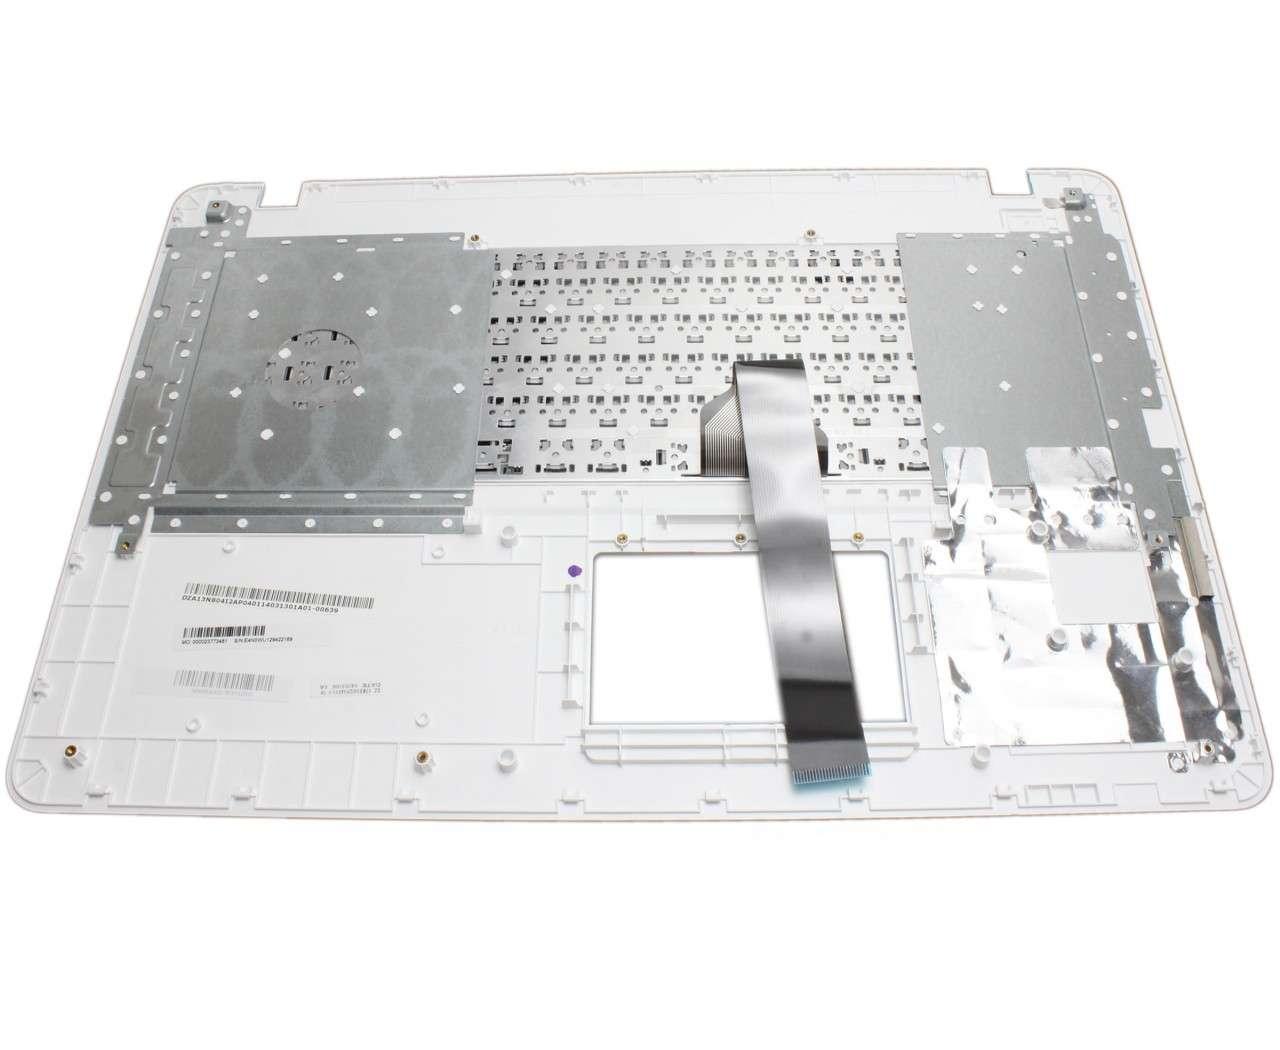 Tastatura Asus 90NB0601-R31UI0 neagra cu Palmrest alb imagine